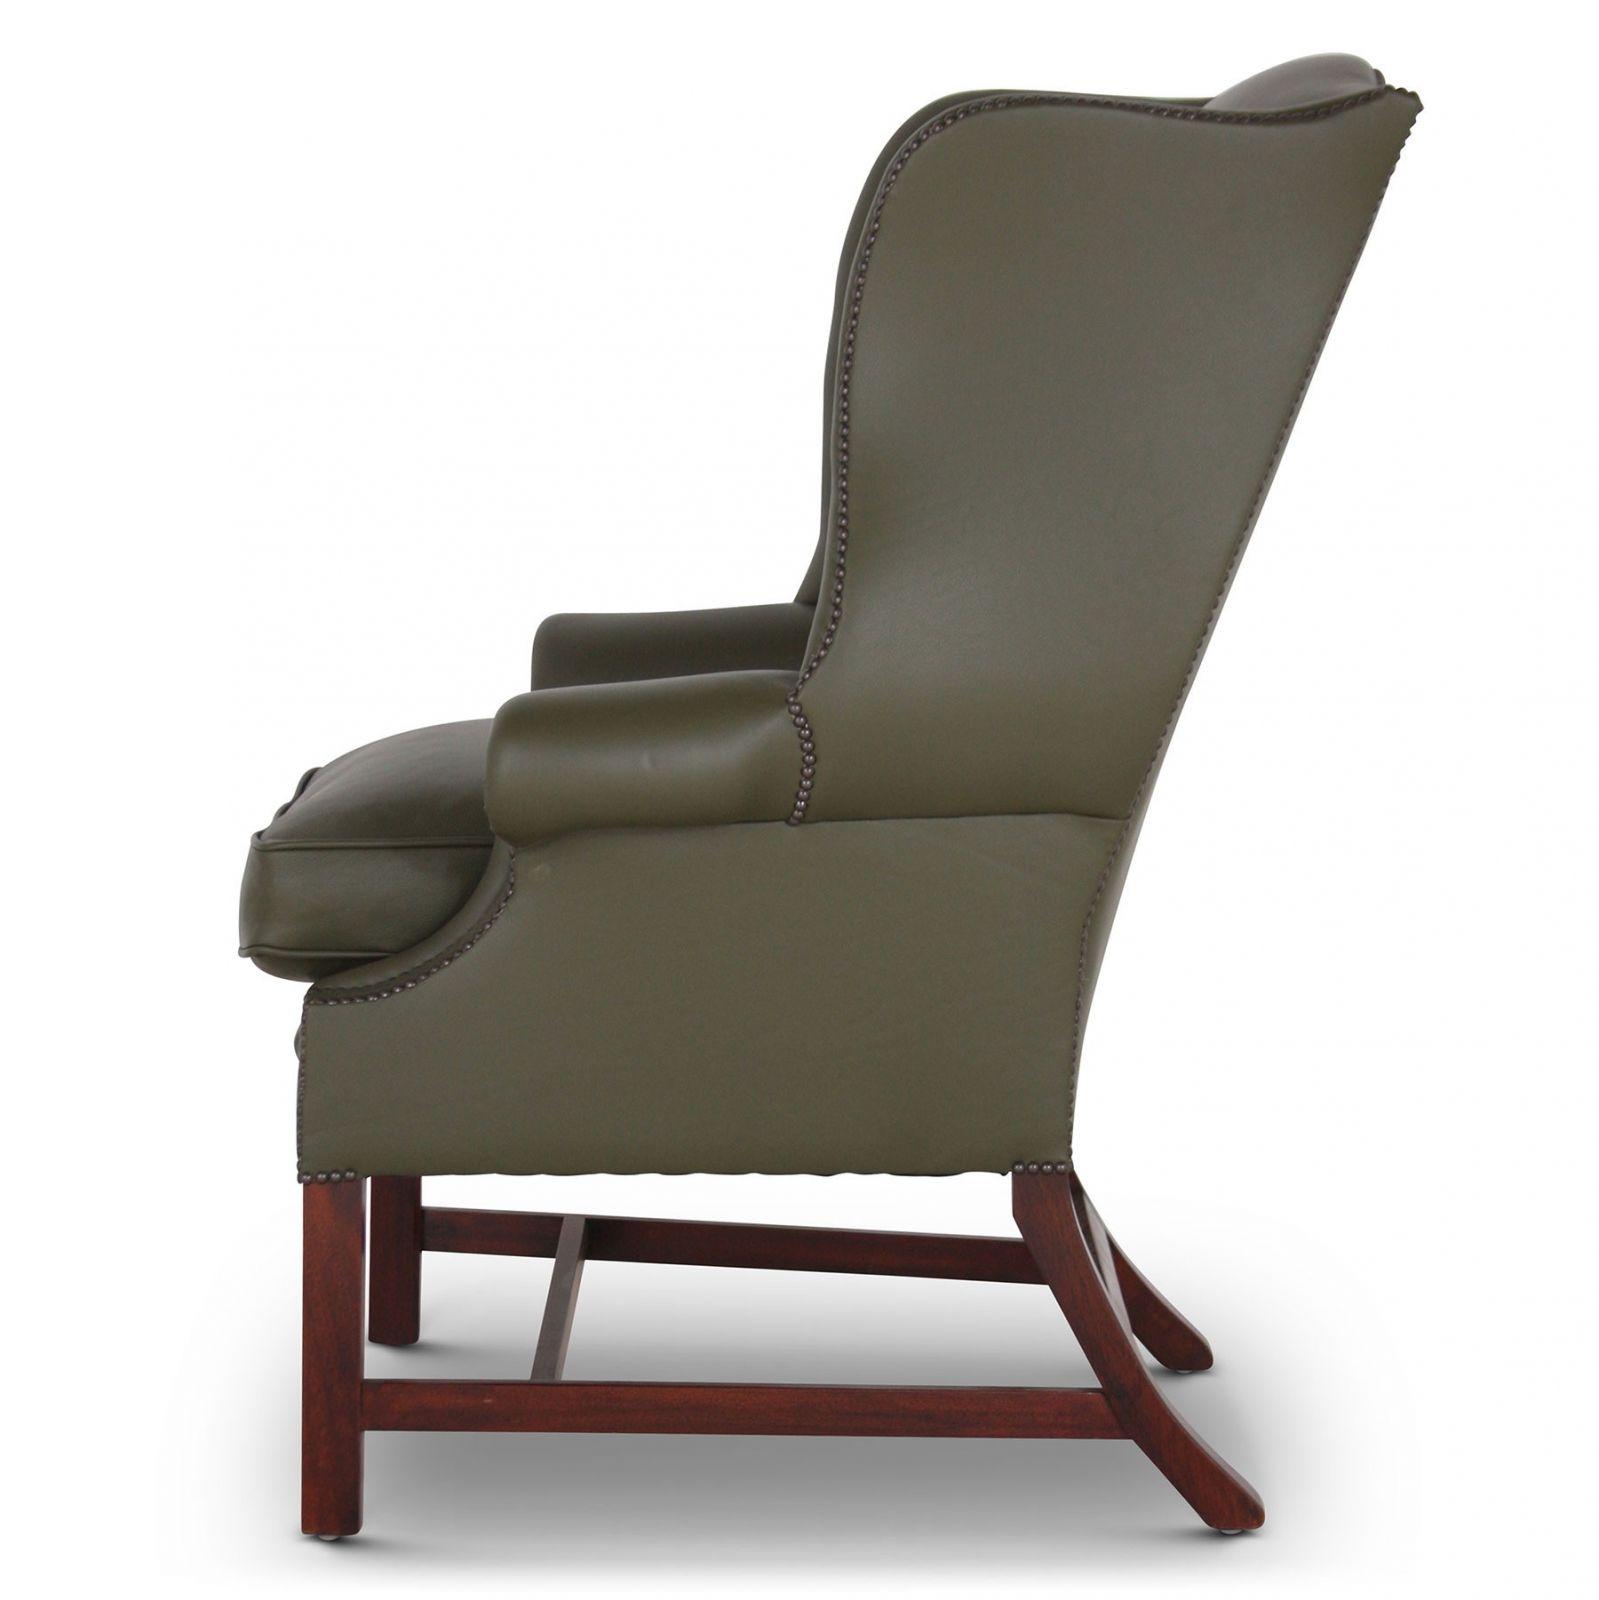 Georgian wing chair in green leather